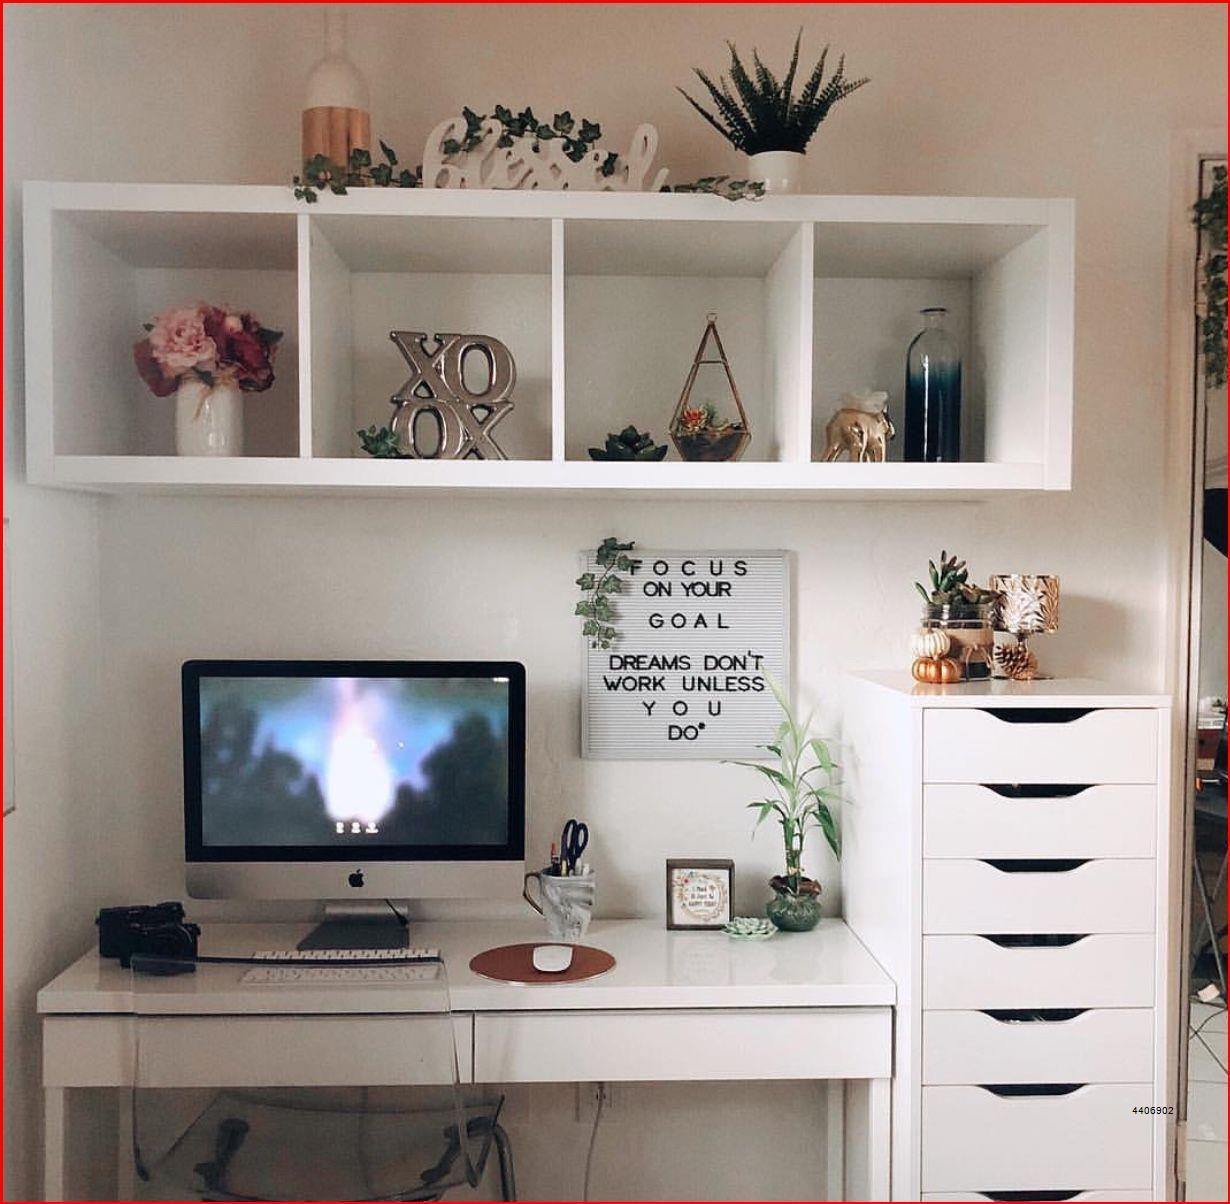 Bookcase Bookshelf Wooden Decorative Design Specia